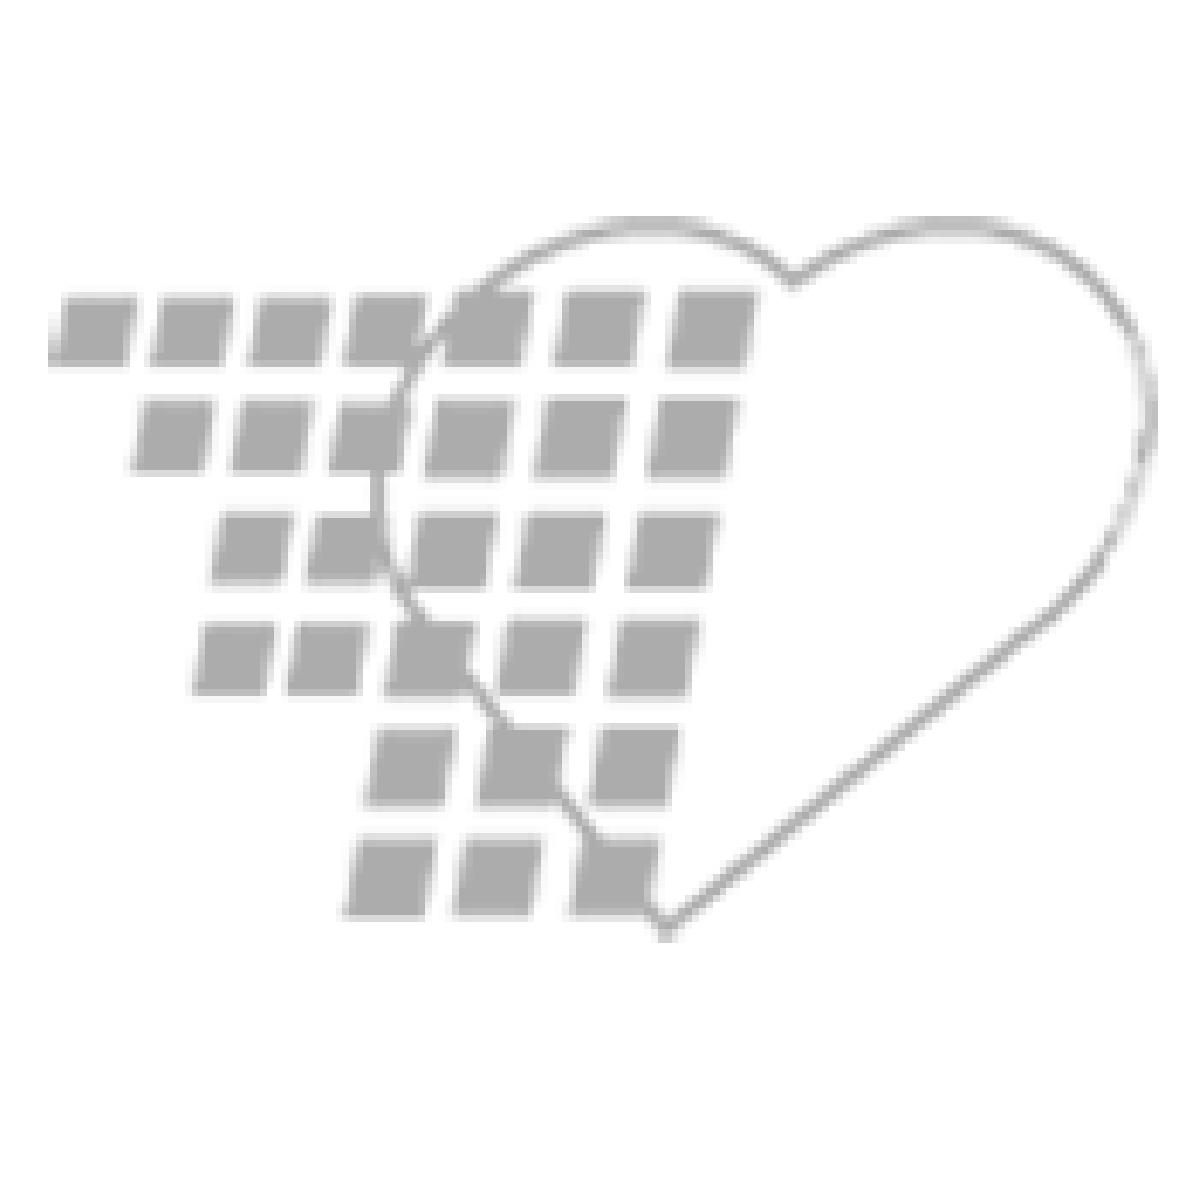 09-79-2000 - Nasco Chronic Care Challenges   - Simulation Glasses